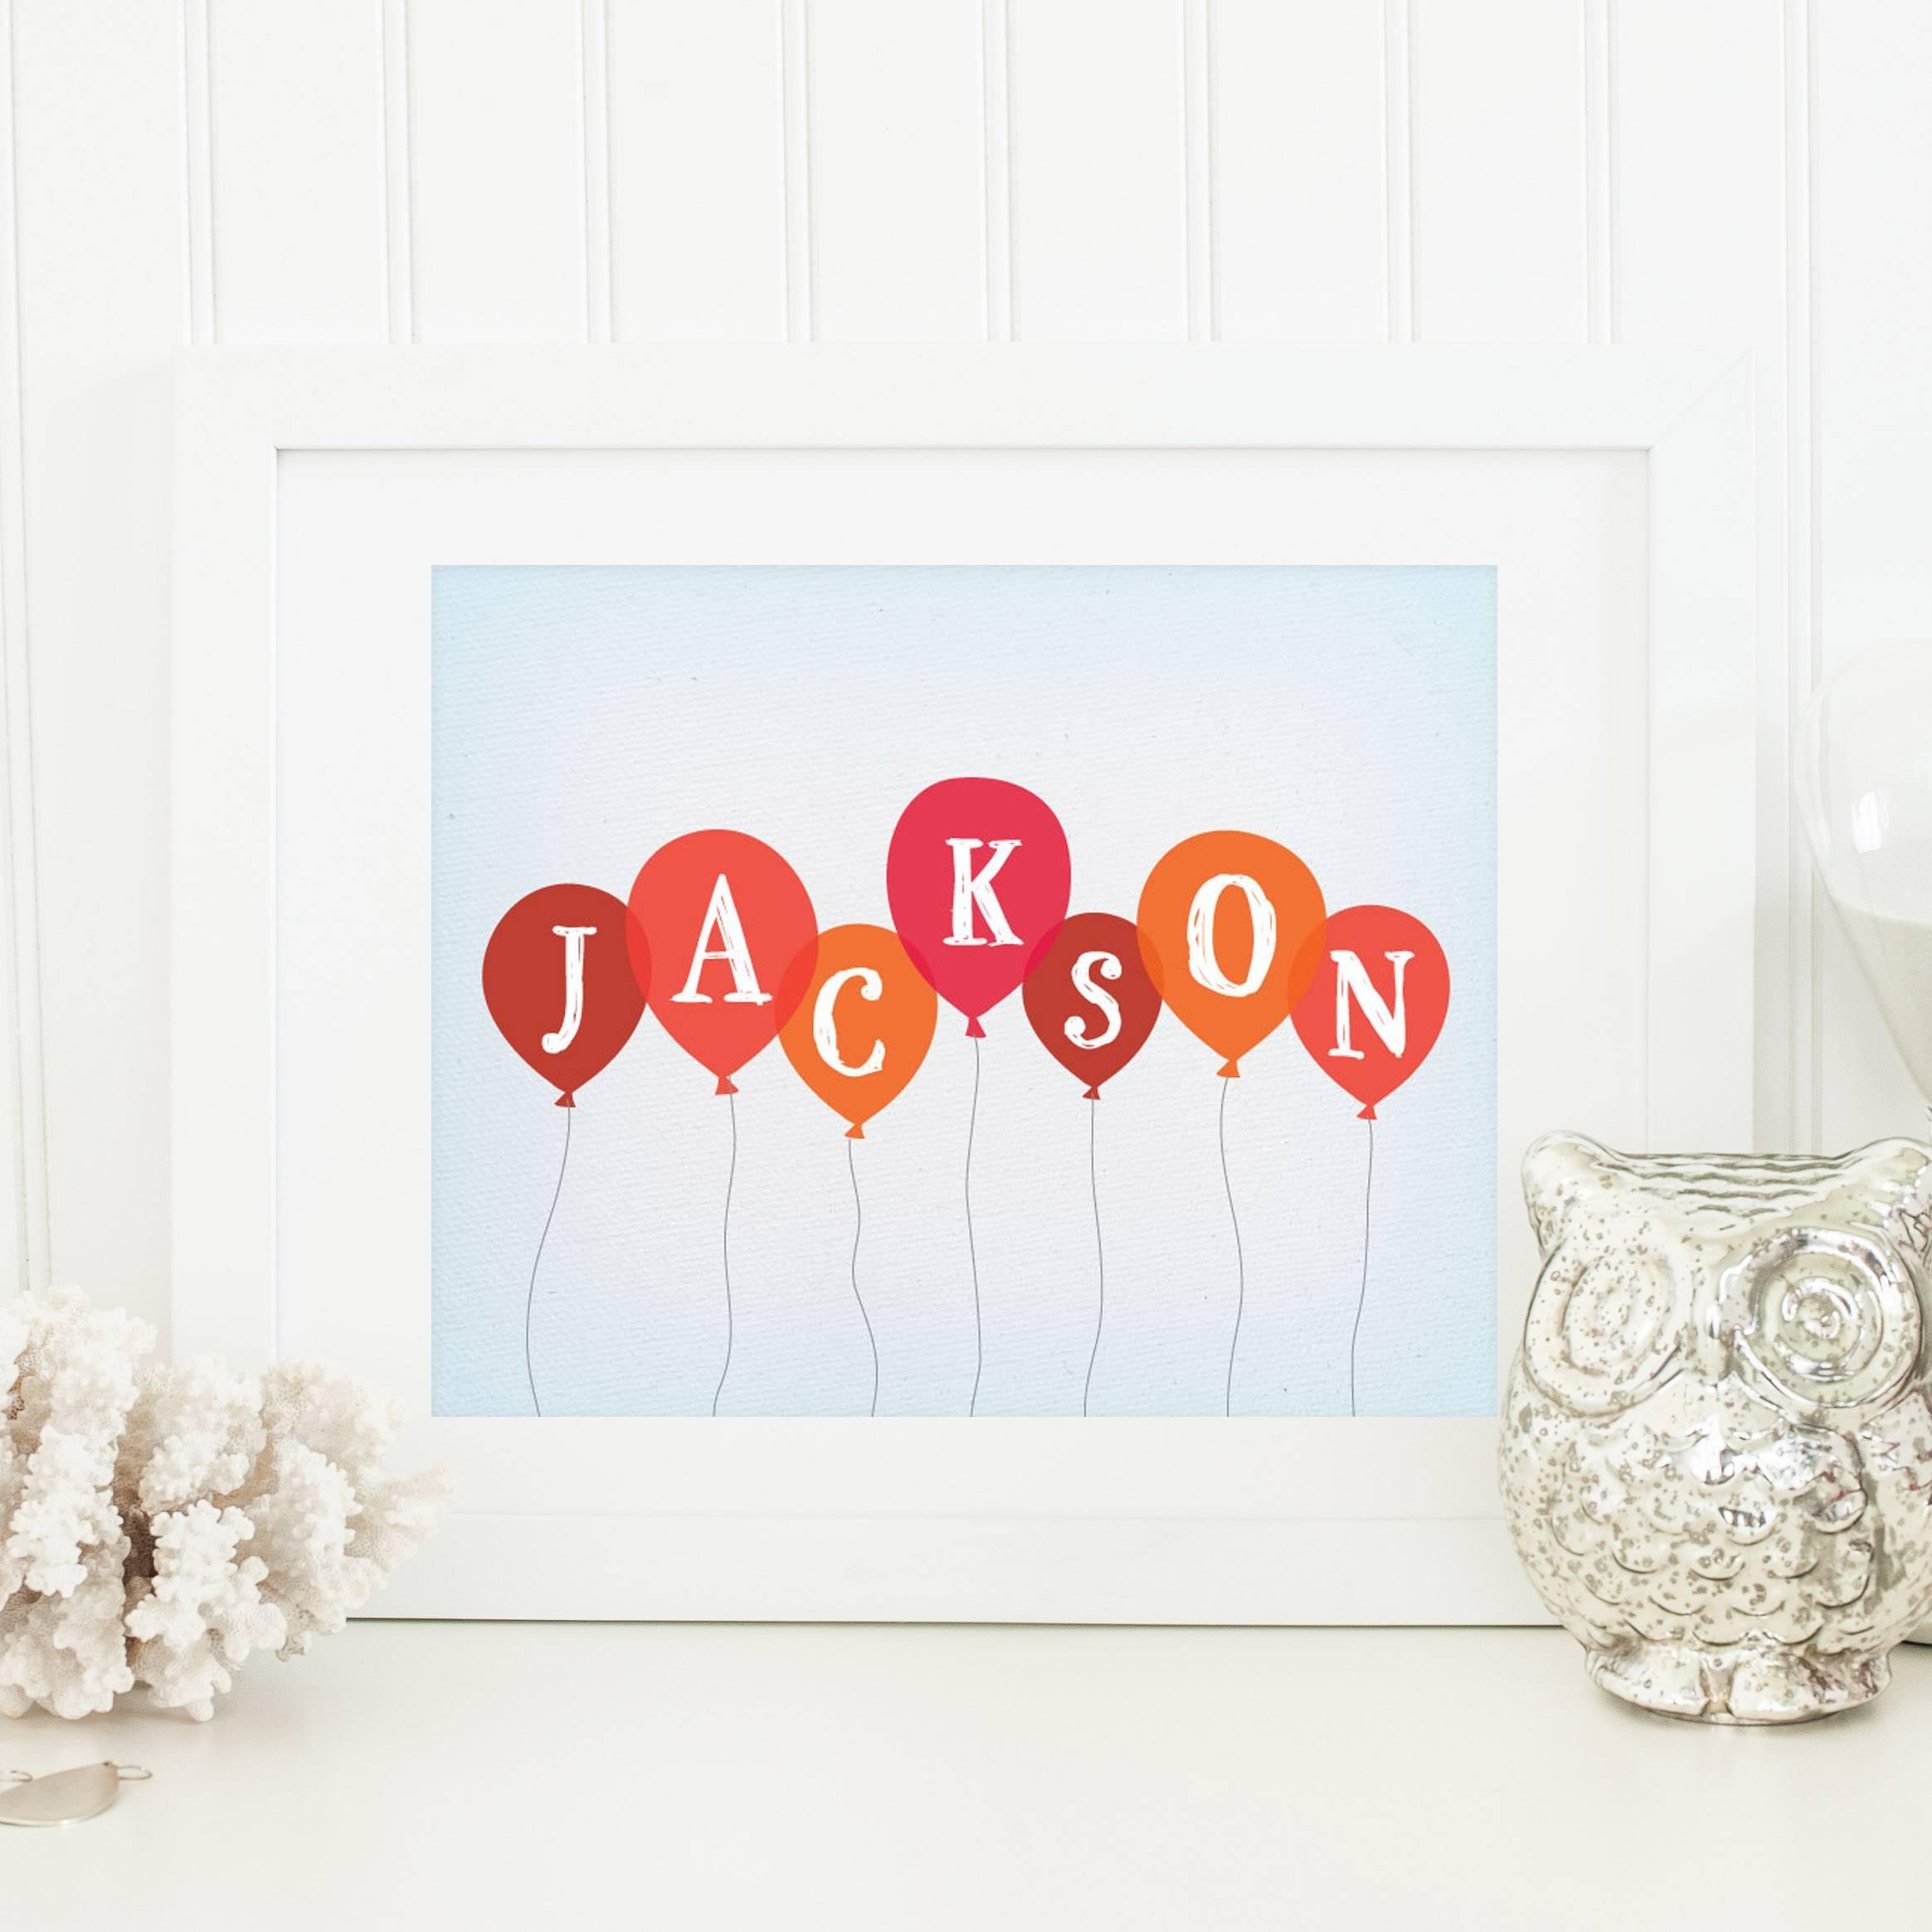 Baby Balloon Art Print Regarding Newest Personalized Nursery Wall Art (View 2 of 20)